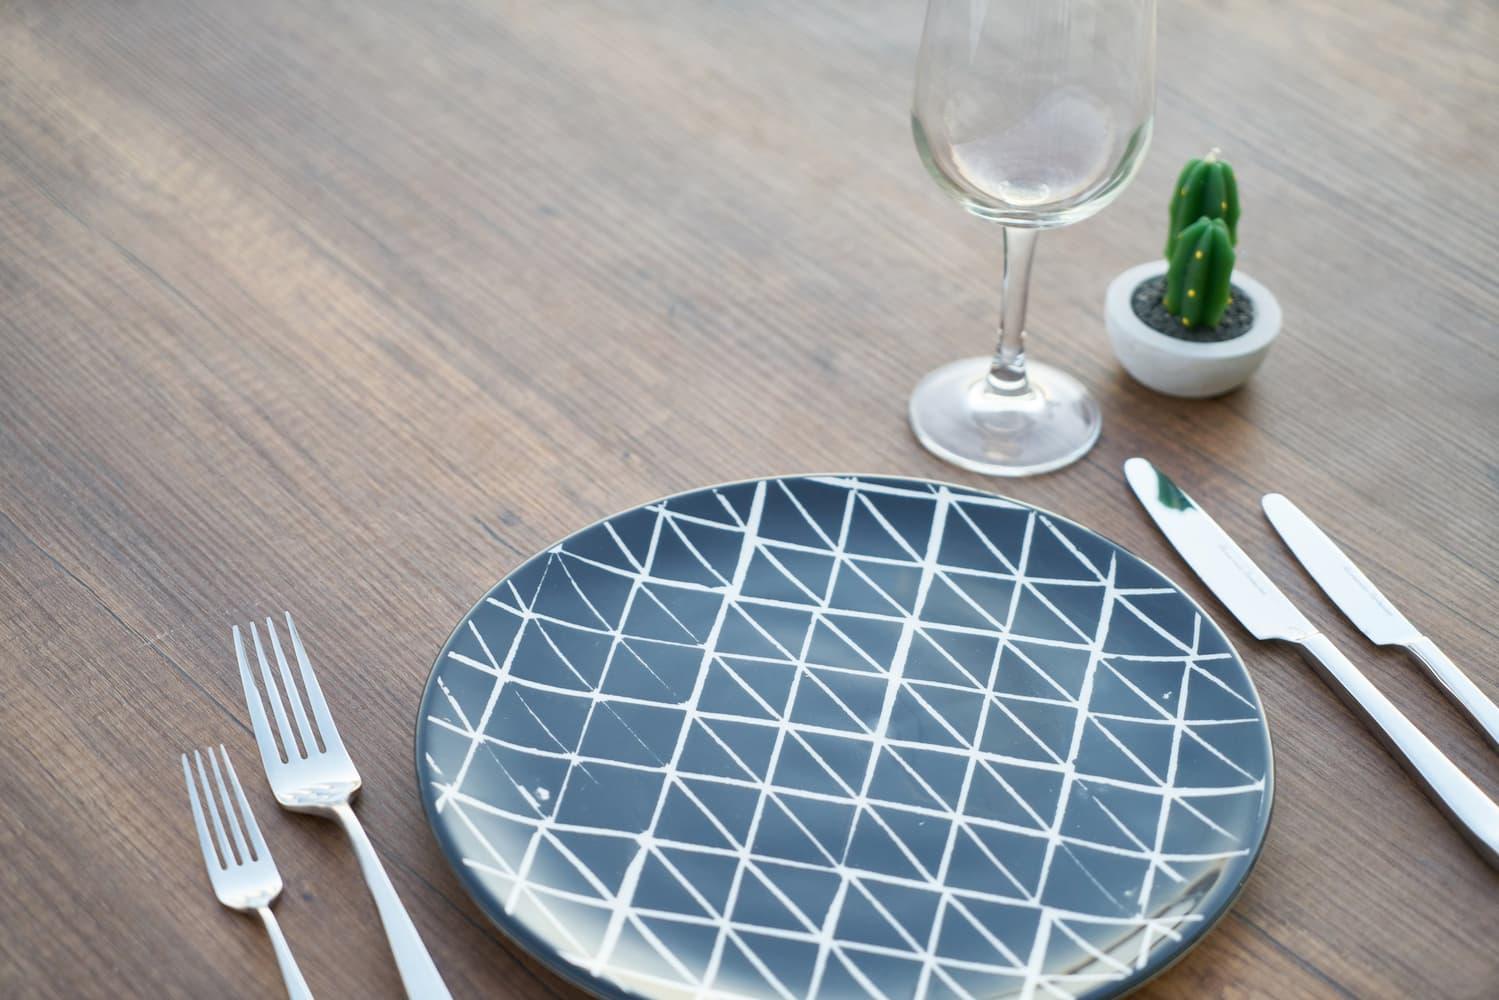 Intermittent fasting in 2021